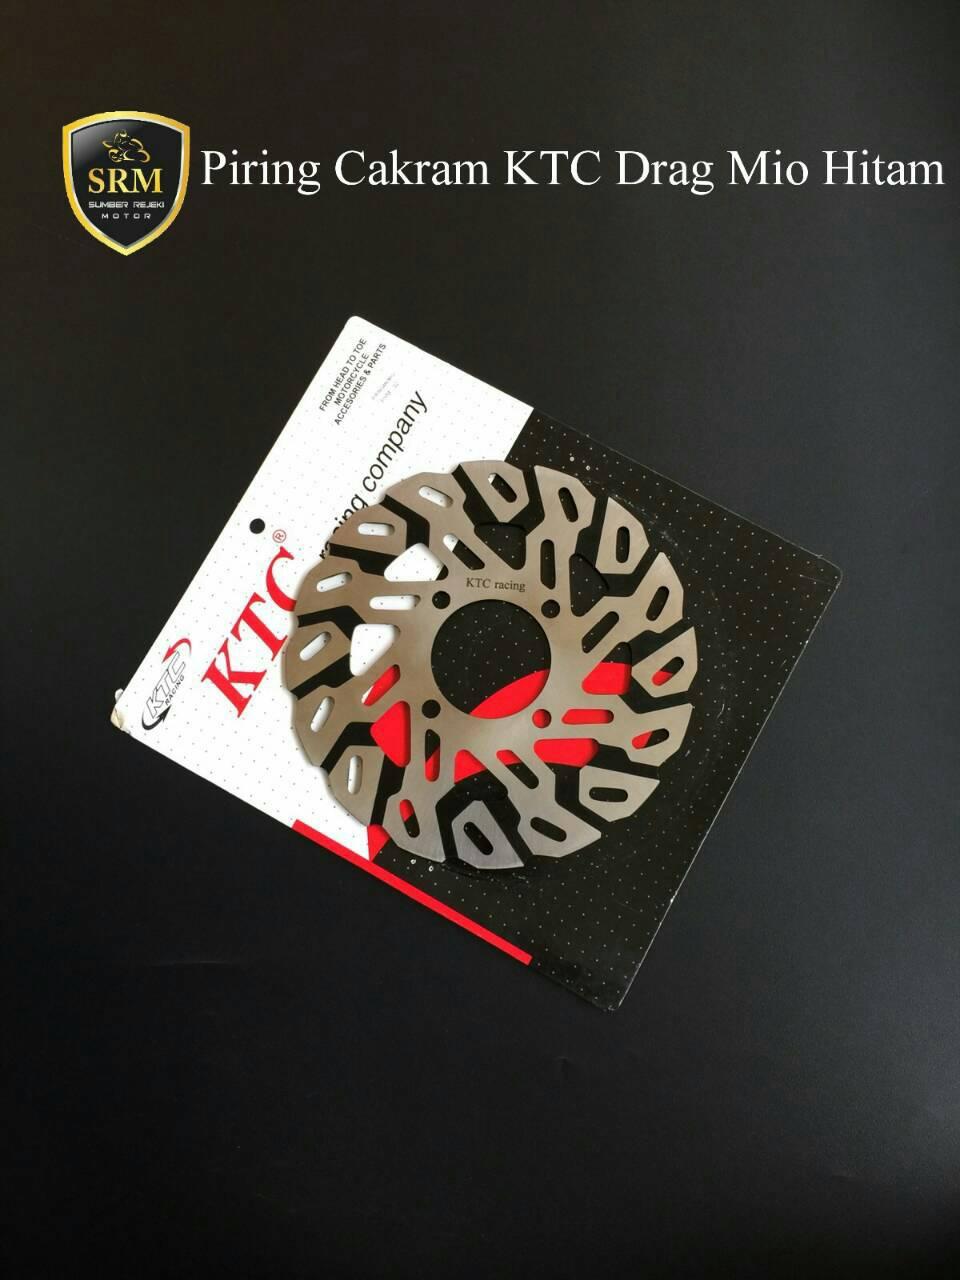 harga Piring Cakram KTC Drag Mio Hitam Tokopedia.com